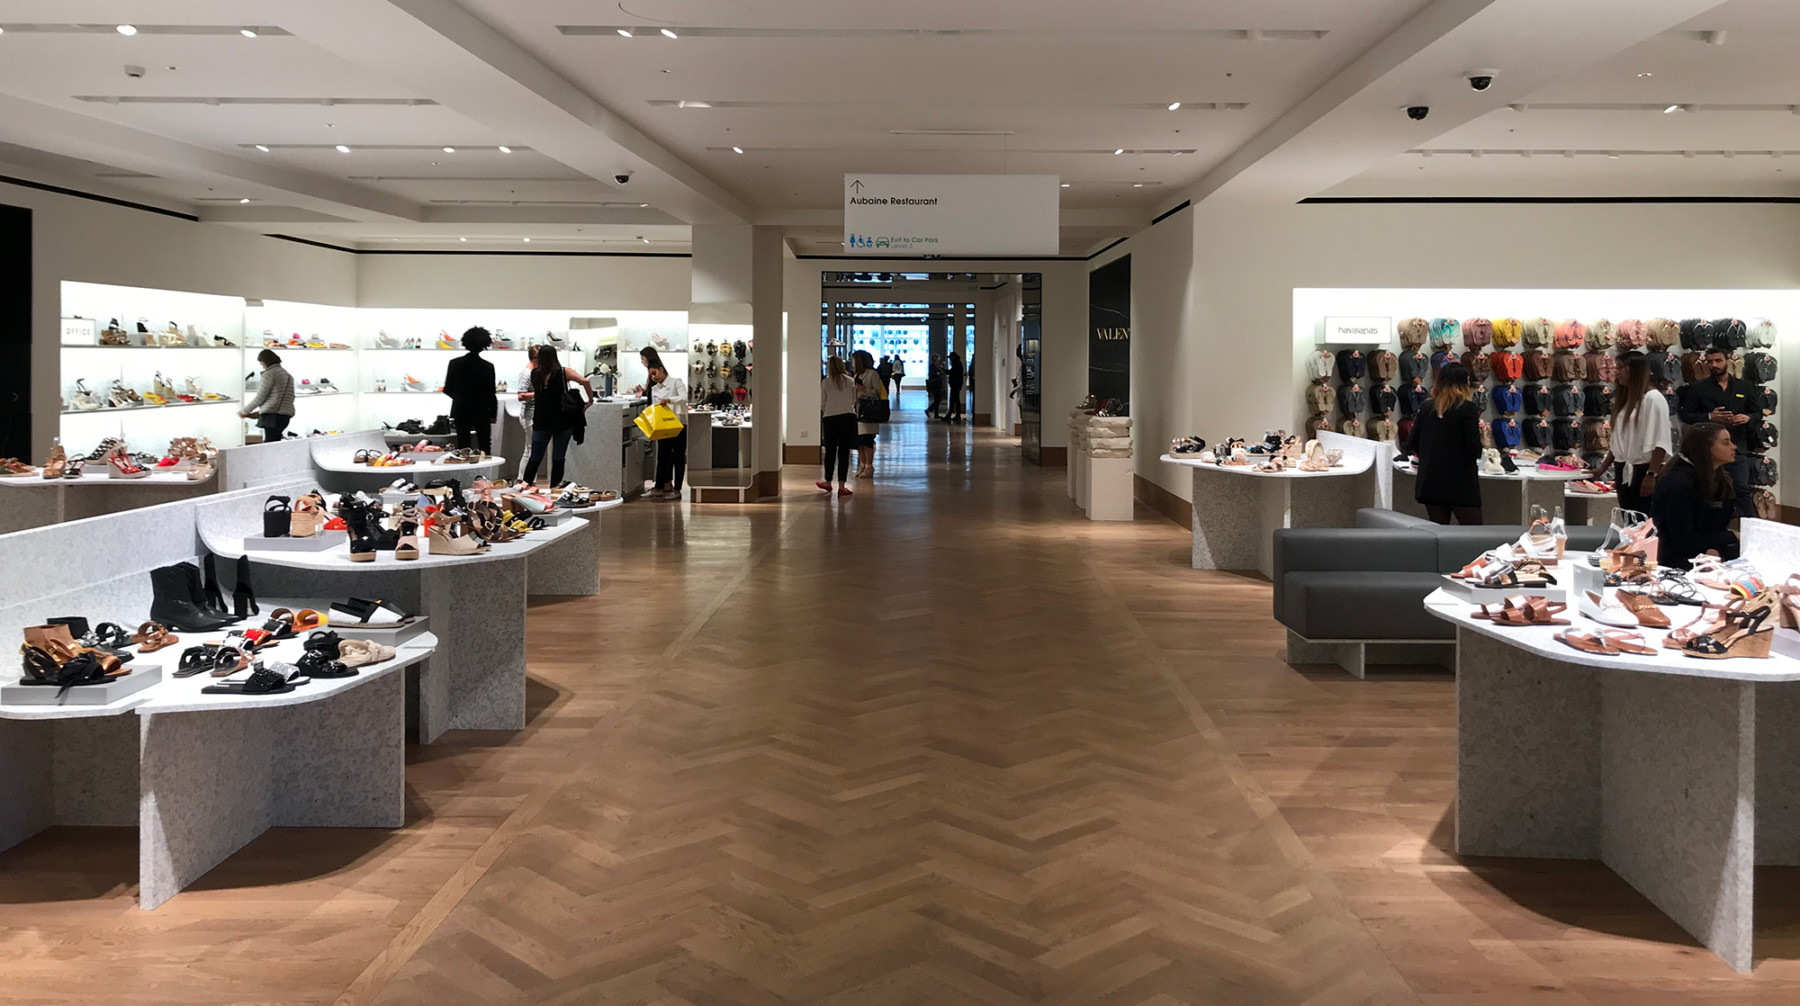 Jamie-Fobert-Architects-Selfridges-Womens-Shoes-Retail